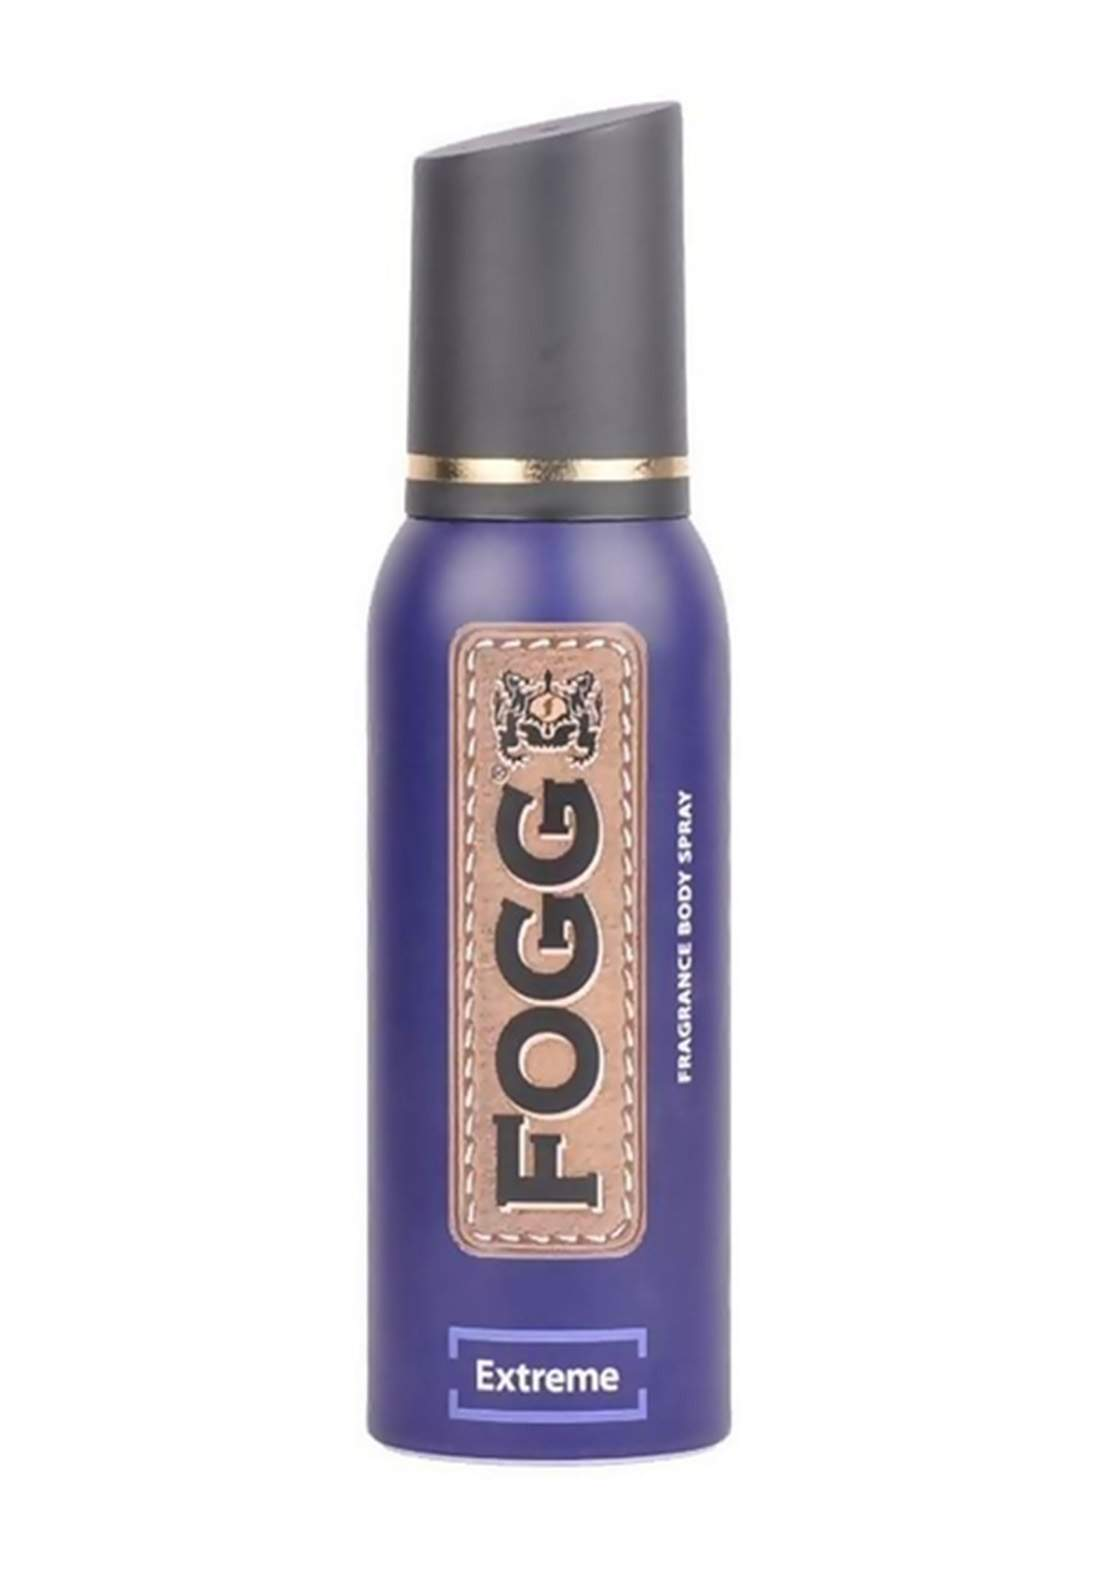 Fogg Extreme Fragrance Body Spray For Men 120ml معطر جسم رجالي